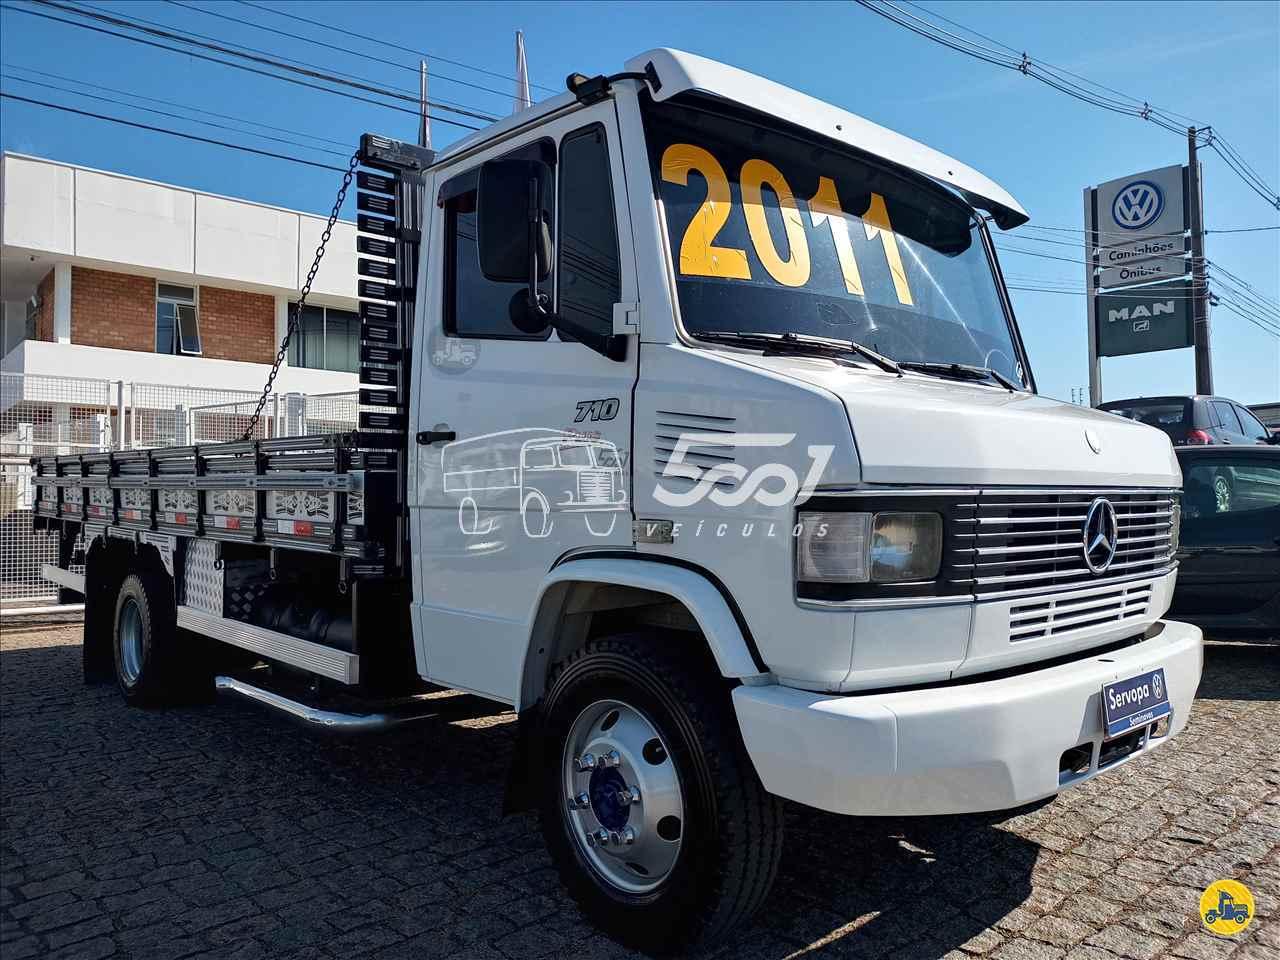 CAMINHAO MERCEDES-BENZ MB 710 Carroceria Cabine Suplementar 3/4 4x2 5001 Veículos - Curitiba CURITIBA PARANÁ PR